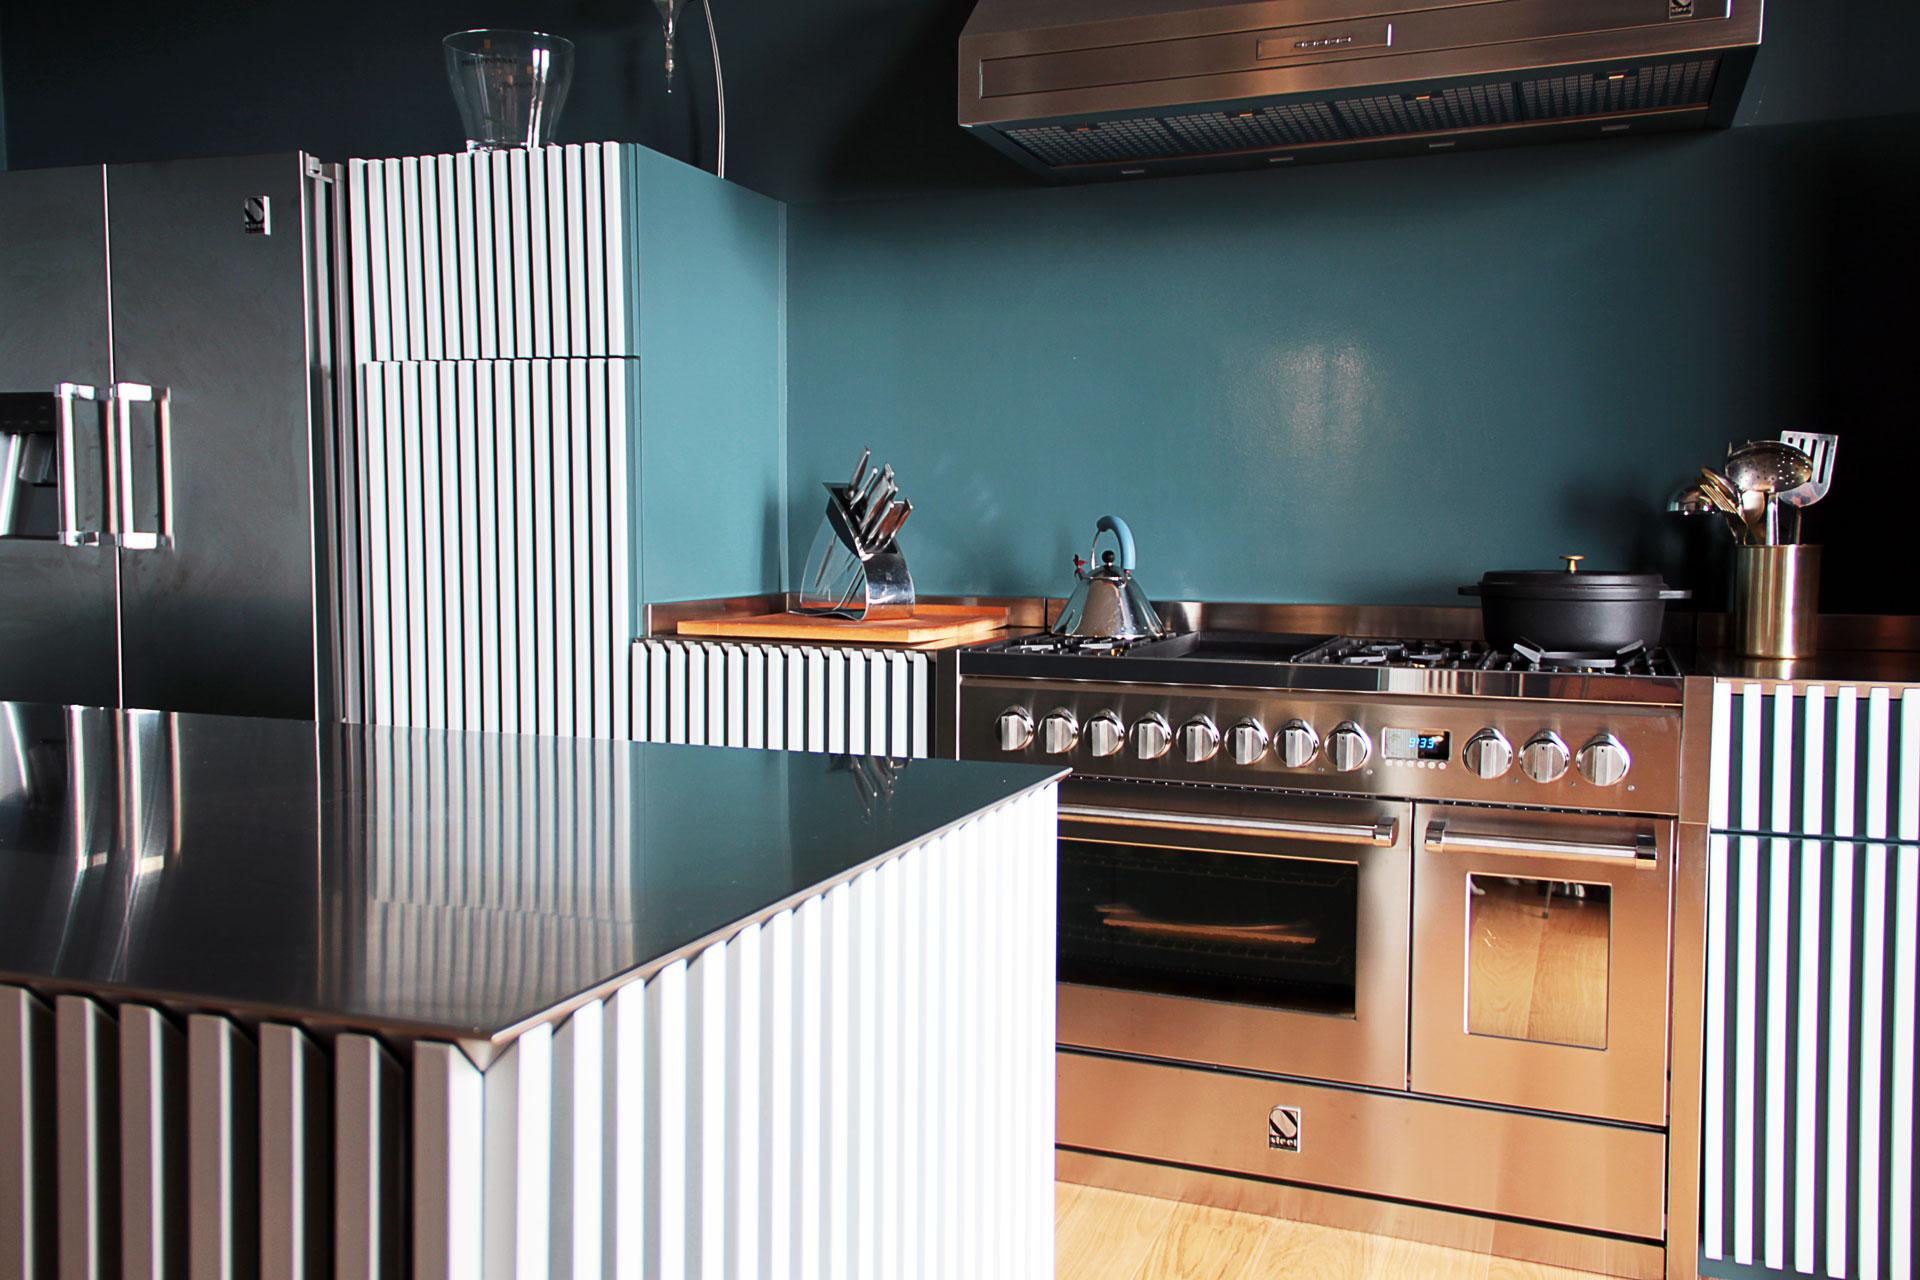 Steel-cuisinière